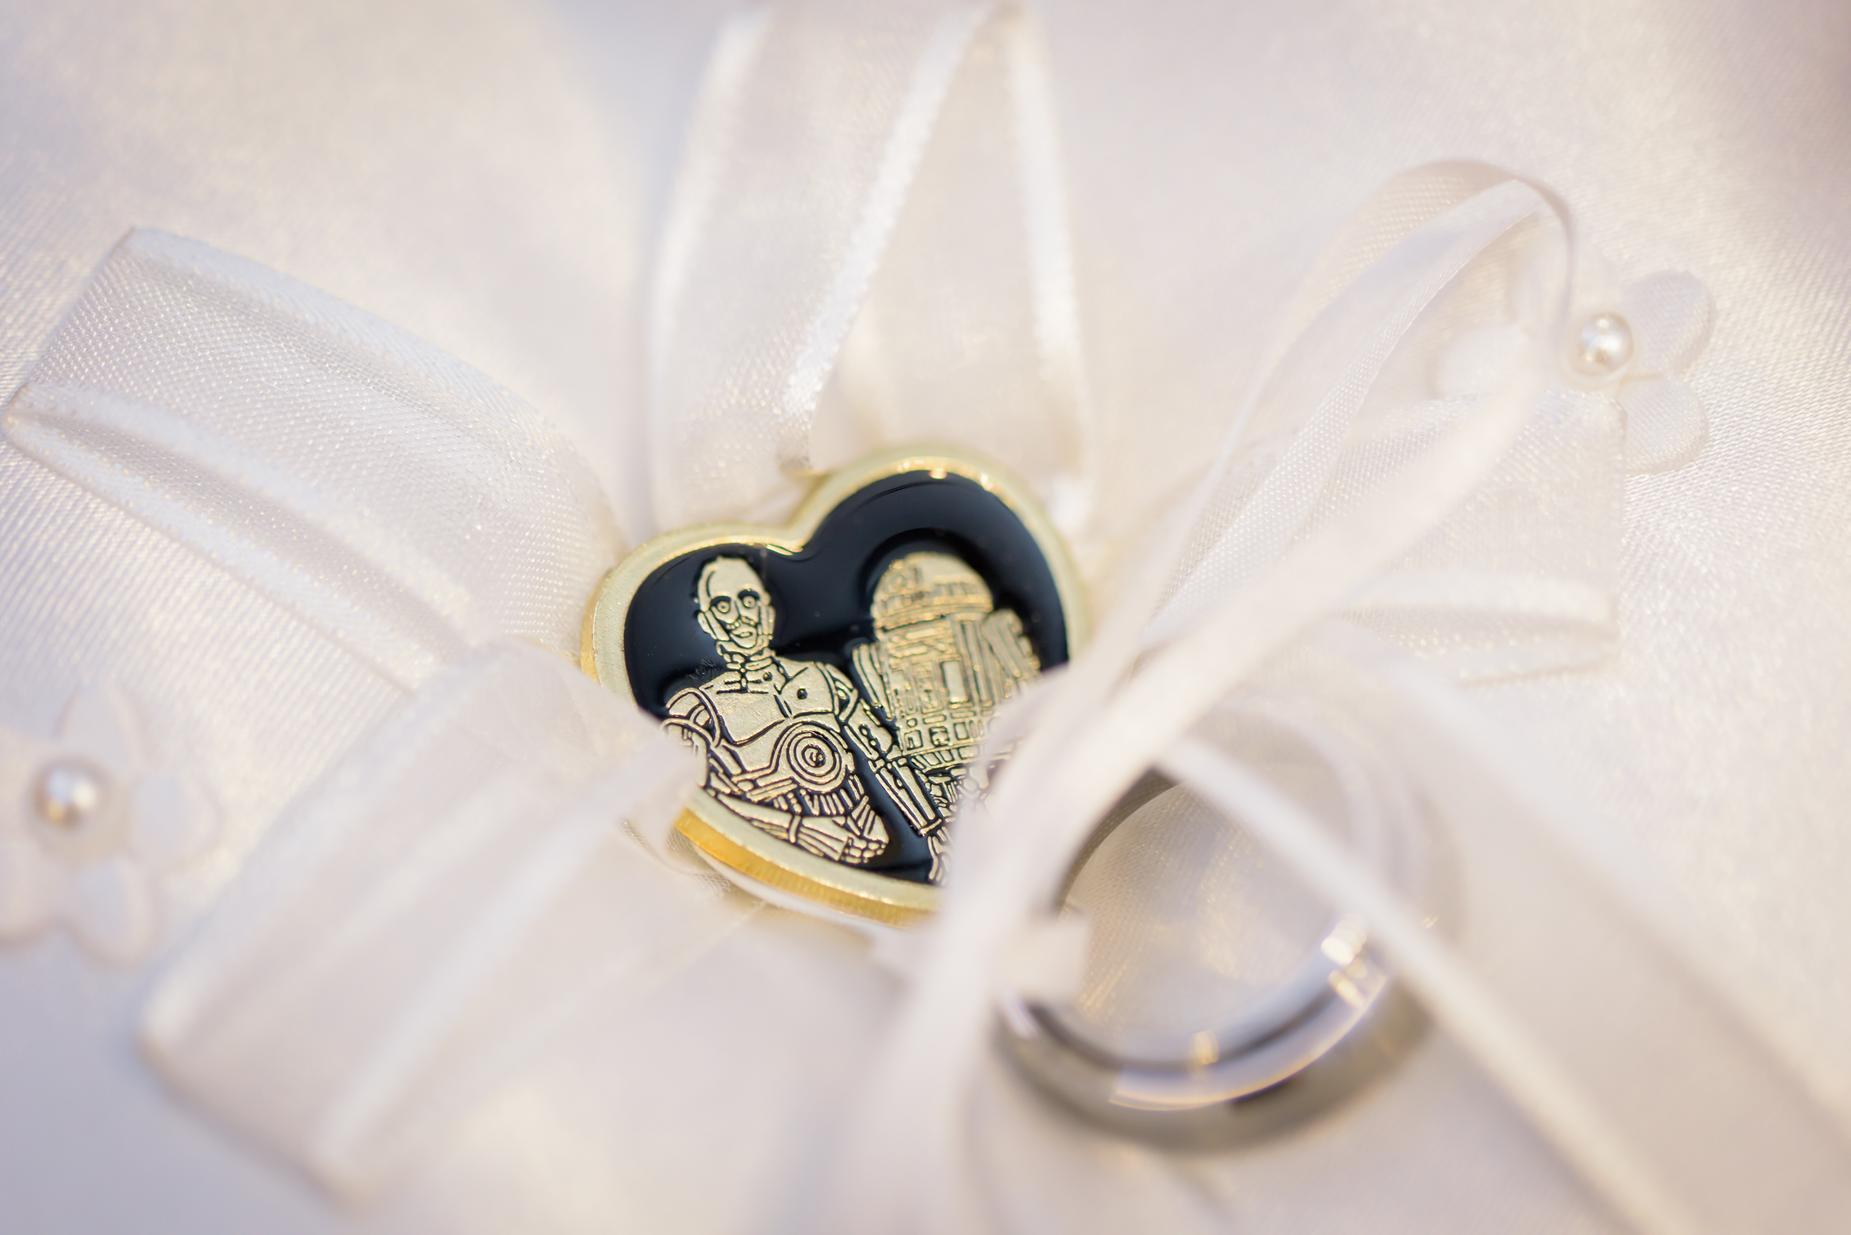 Pin by PH Weddings on Las Vegas Wedding | Pinterest | Las vegas ...